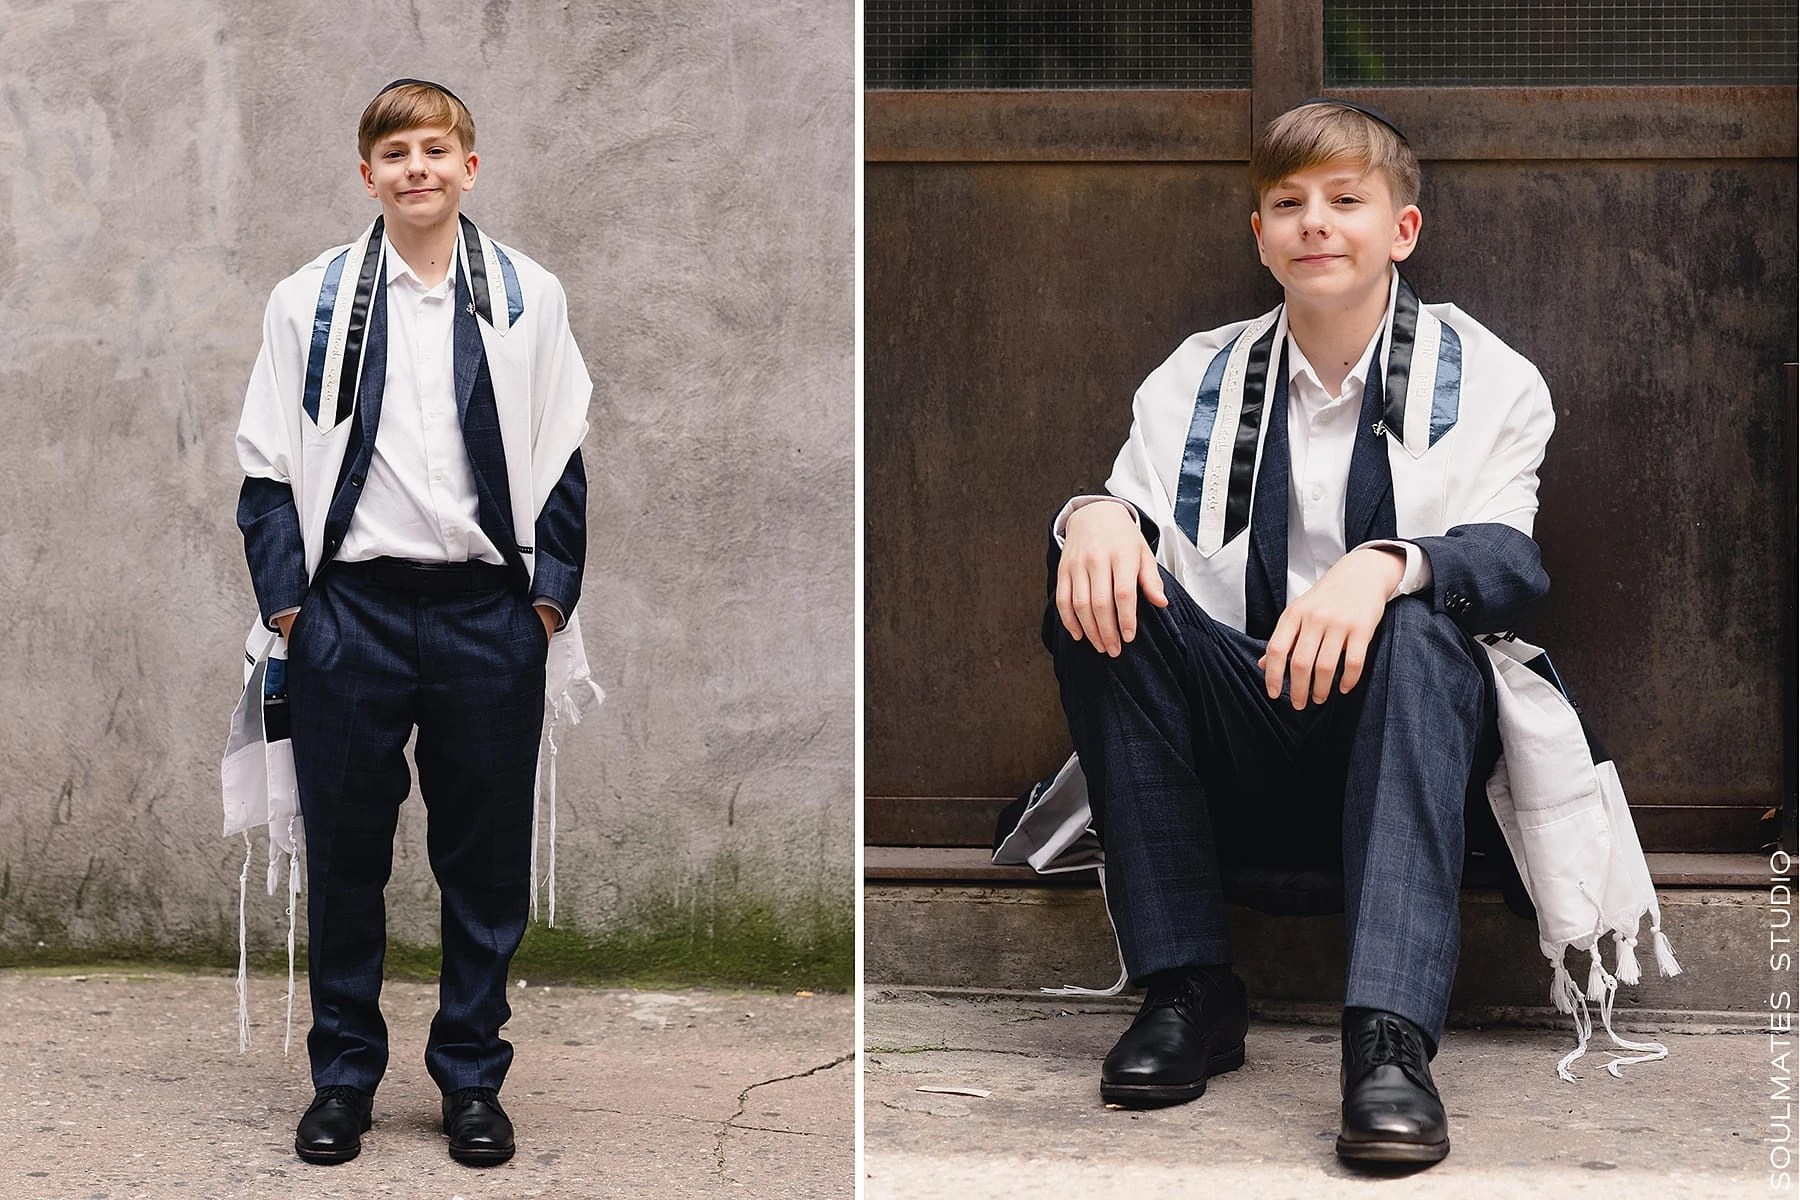 New York Bar mitzvah boy portraits